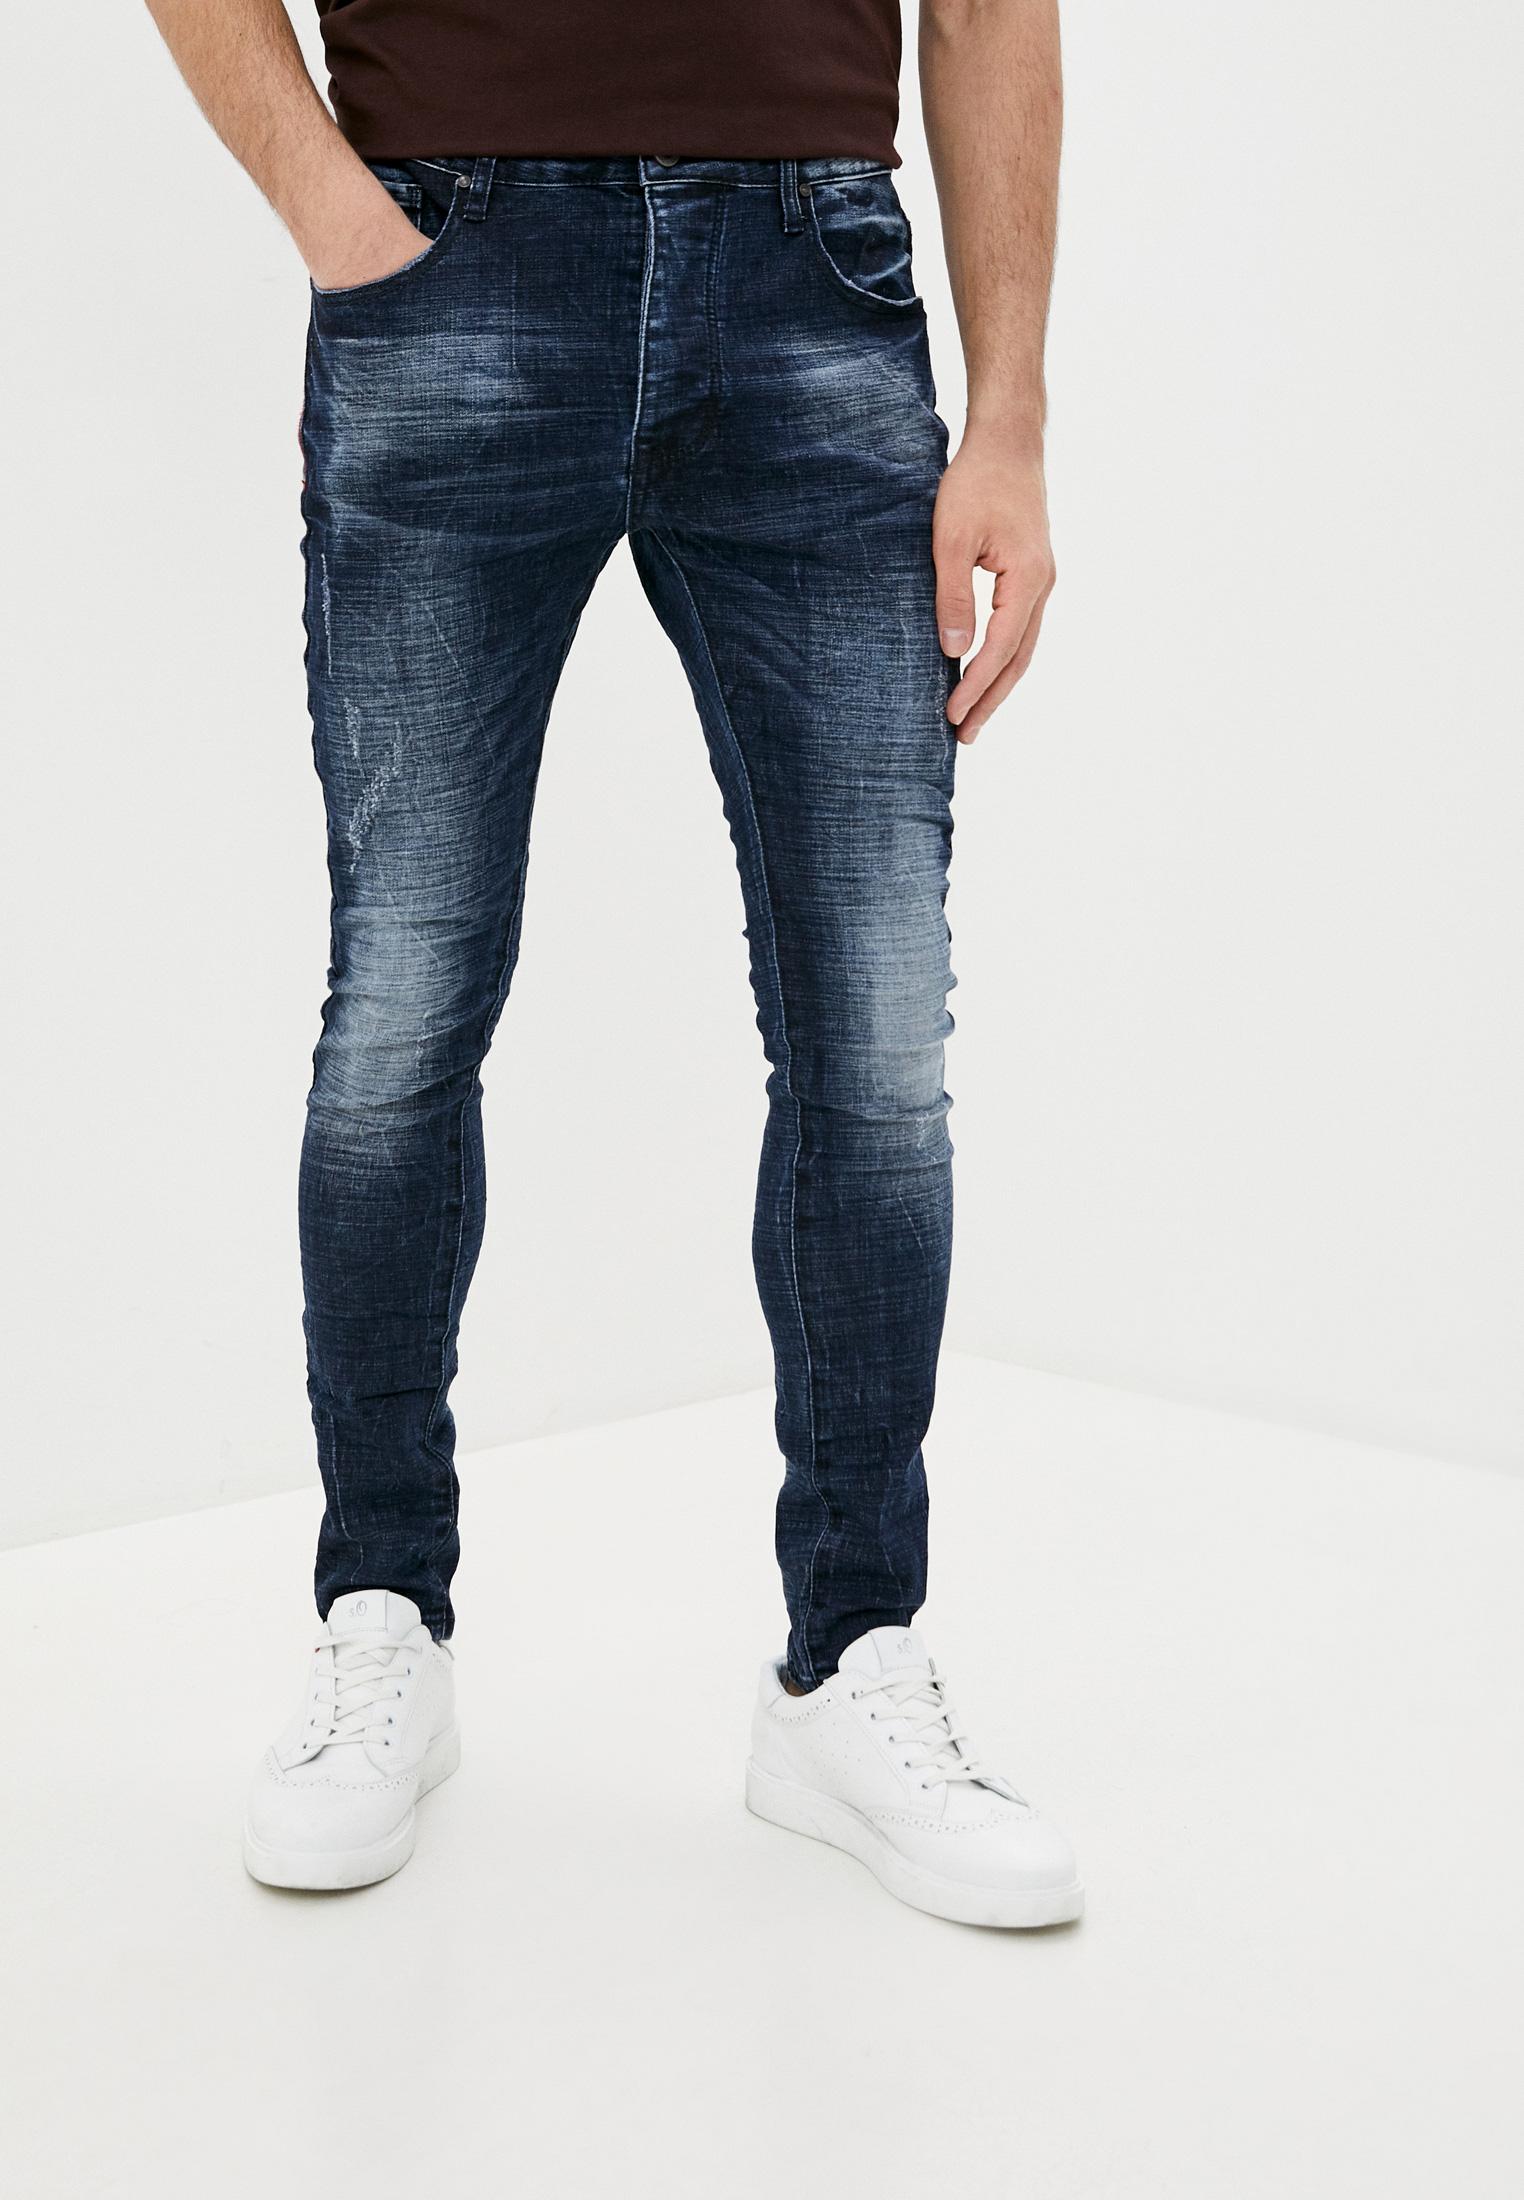 Зауженные джинсы Terance Kole 66067